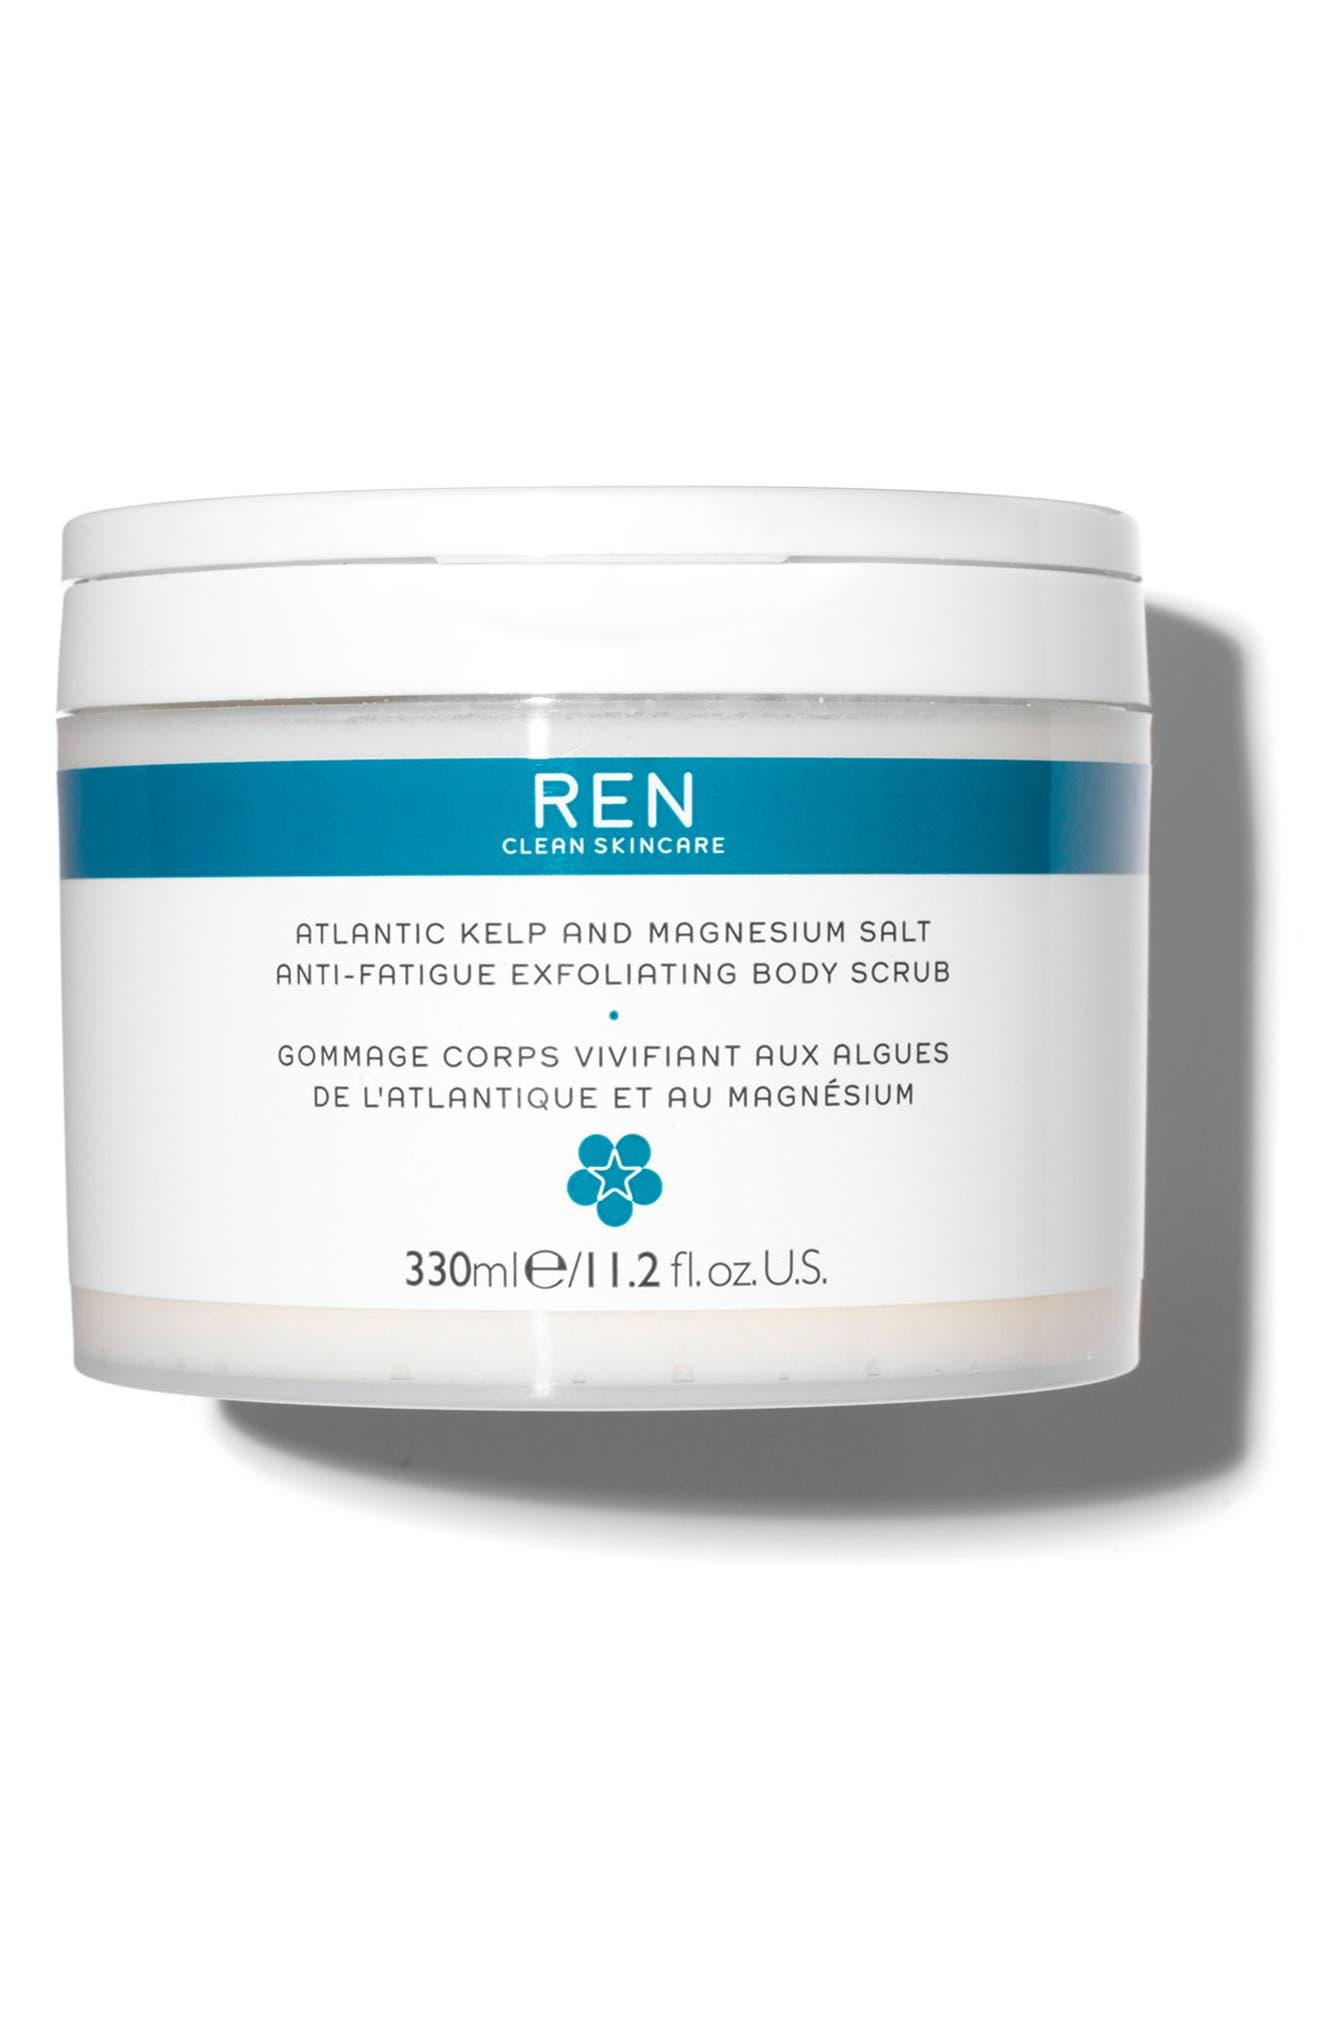 SPACE.NK.apothecary REN Atlantic Kelp and Magnesium Salt Anti-Fatigue Exfoliating Body Scrub,                             Main thumbnail 1, color,                             000